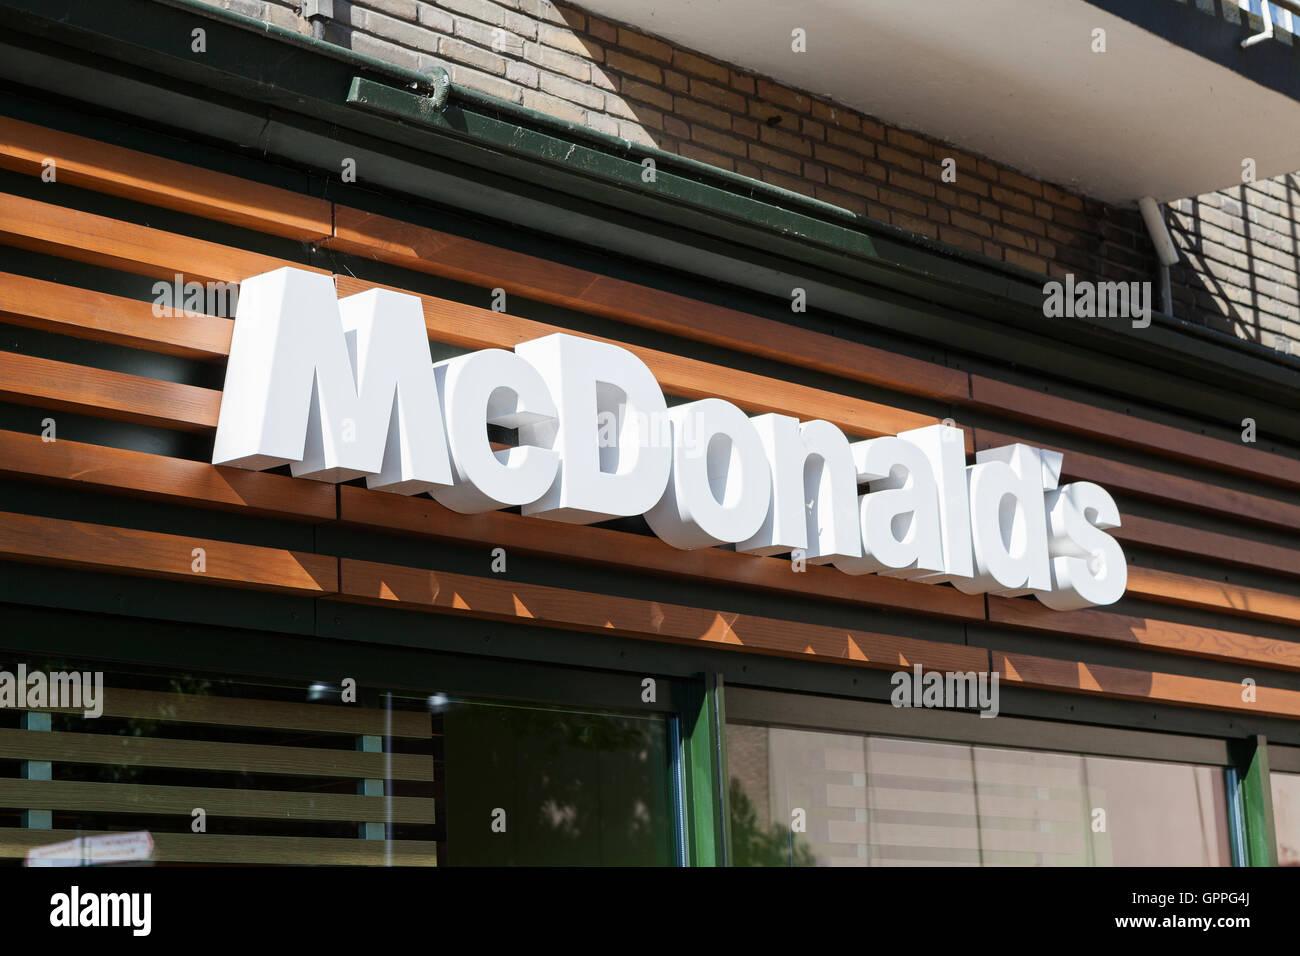 McDonald's sign, McDonald's is the world's largest chain of hamburger fast food restaurants, serving around 68 million Stock Photo